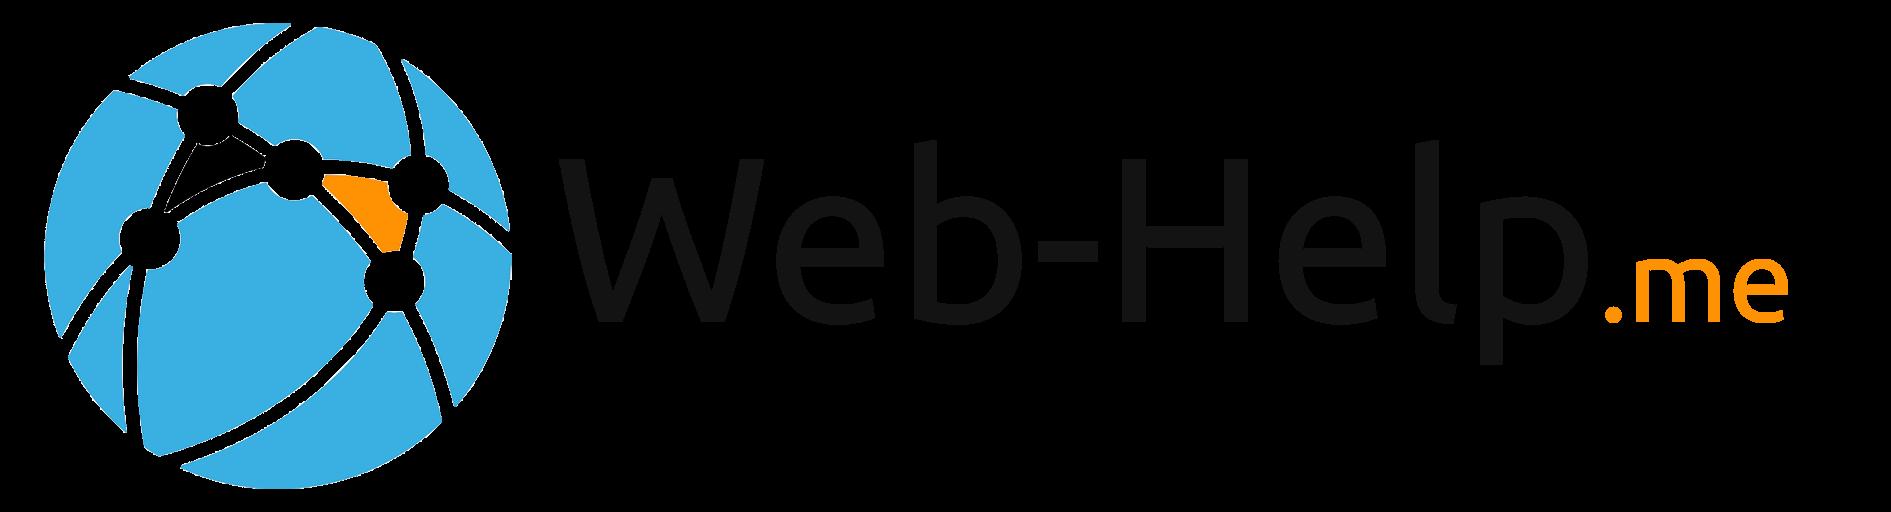 Web-Help.me